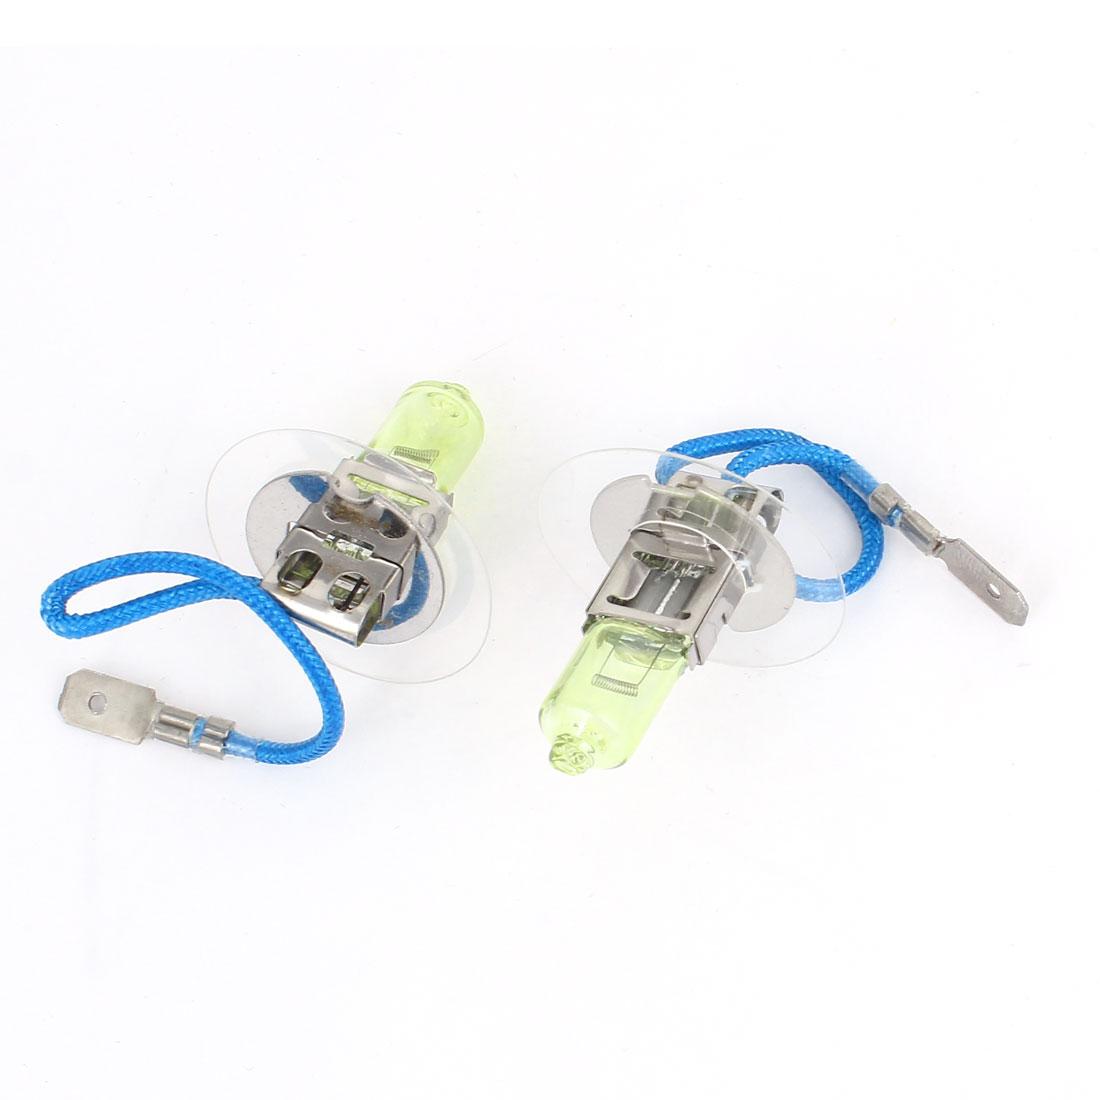 2 Pcs 12V 100W H3 Amber Car DRL Foglight Light Head Spare Bulb Lamp